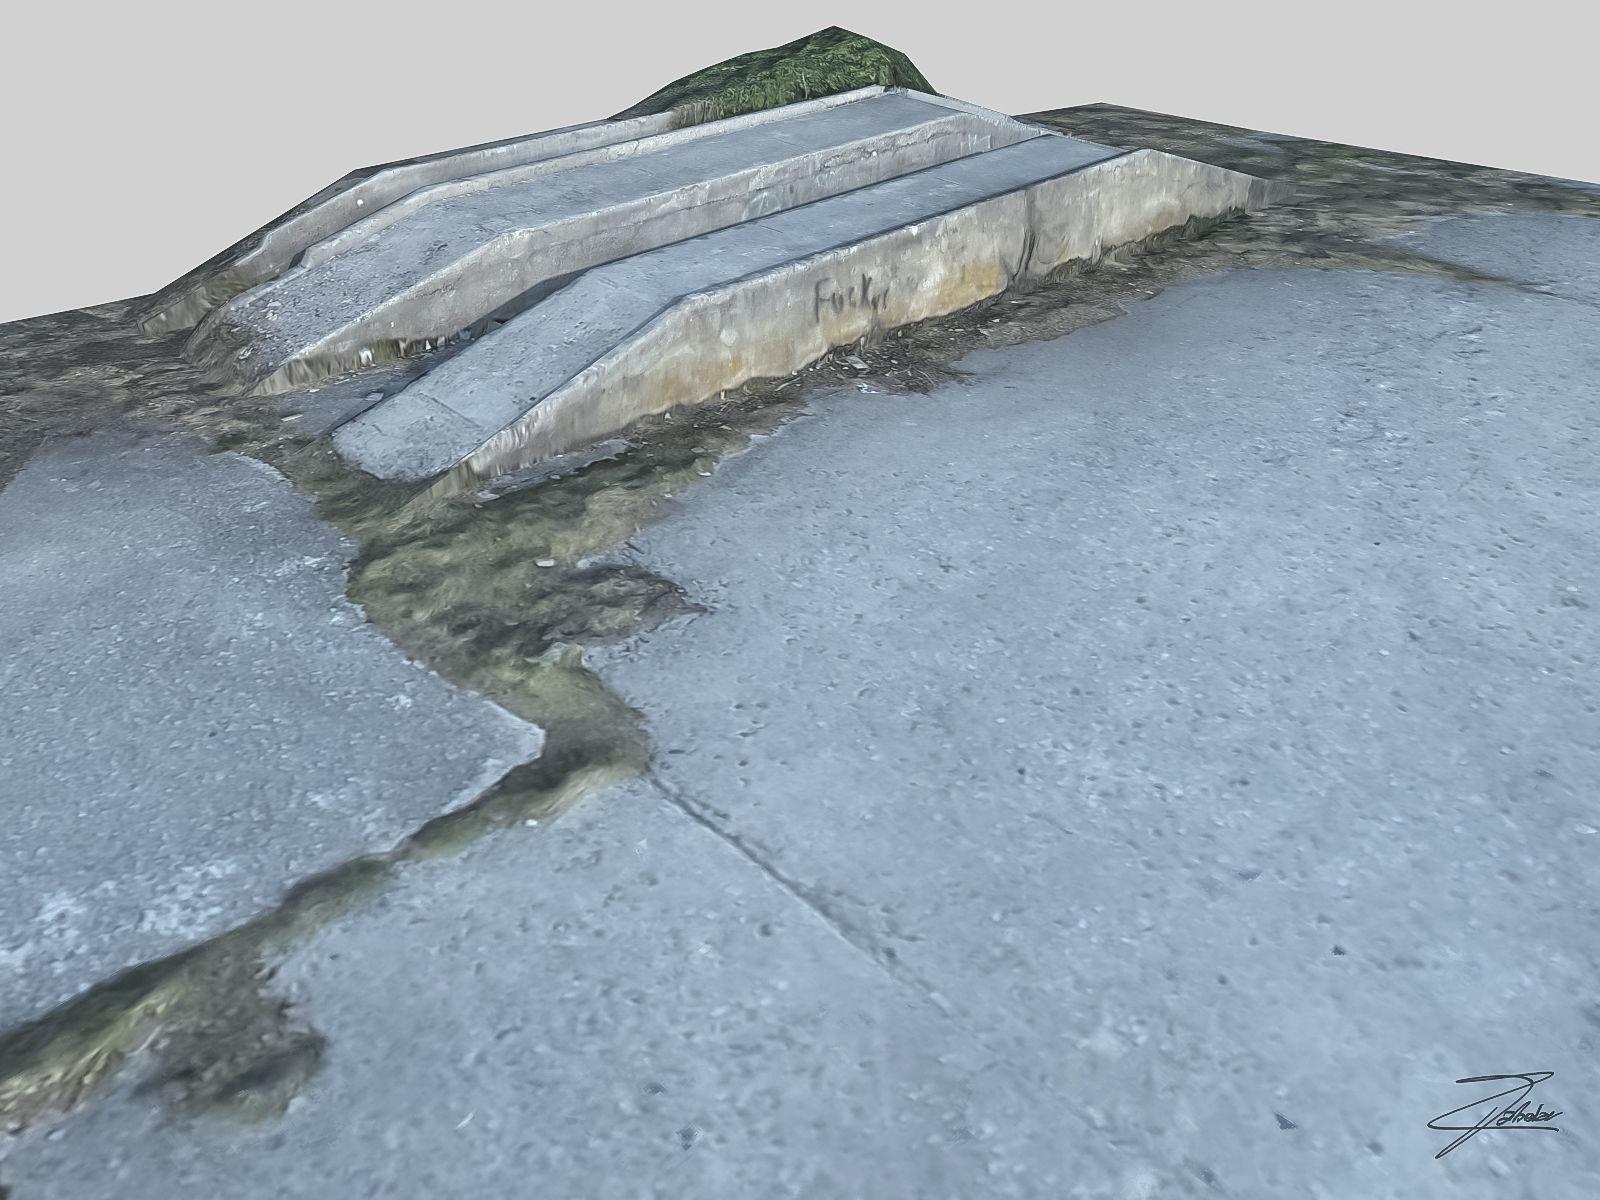 Concrete loading ramp